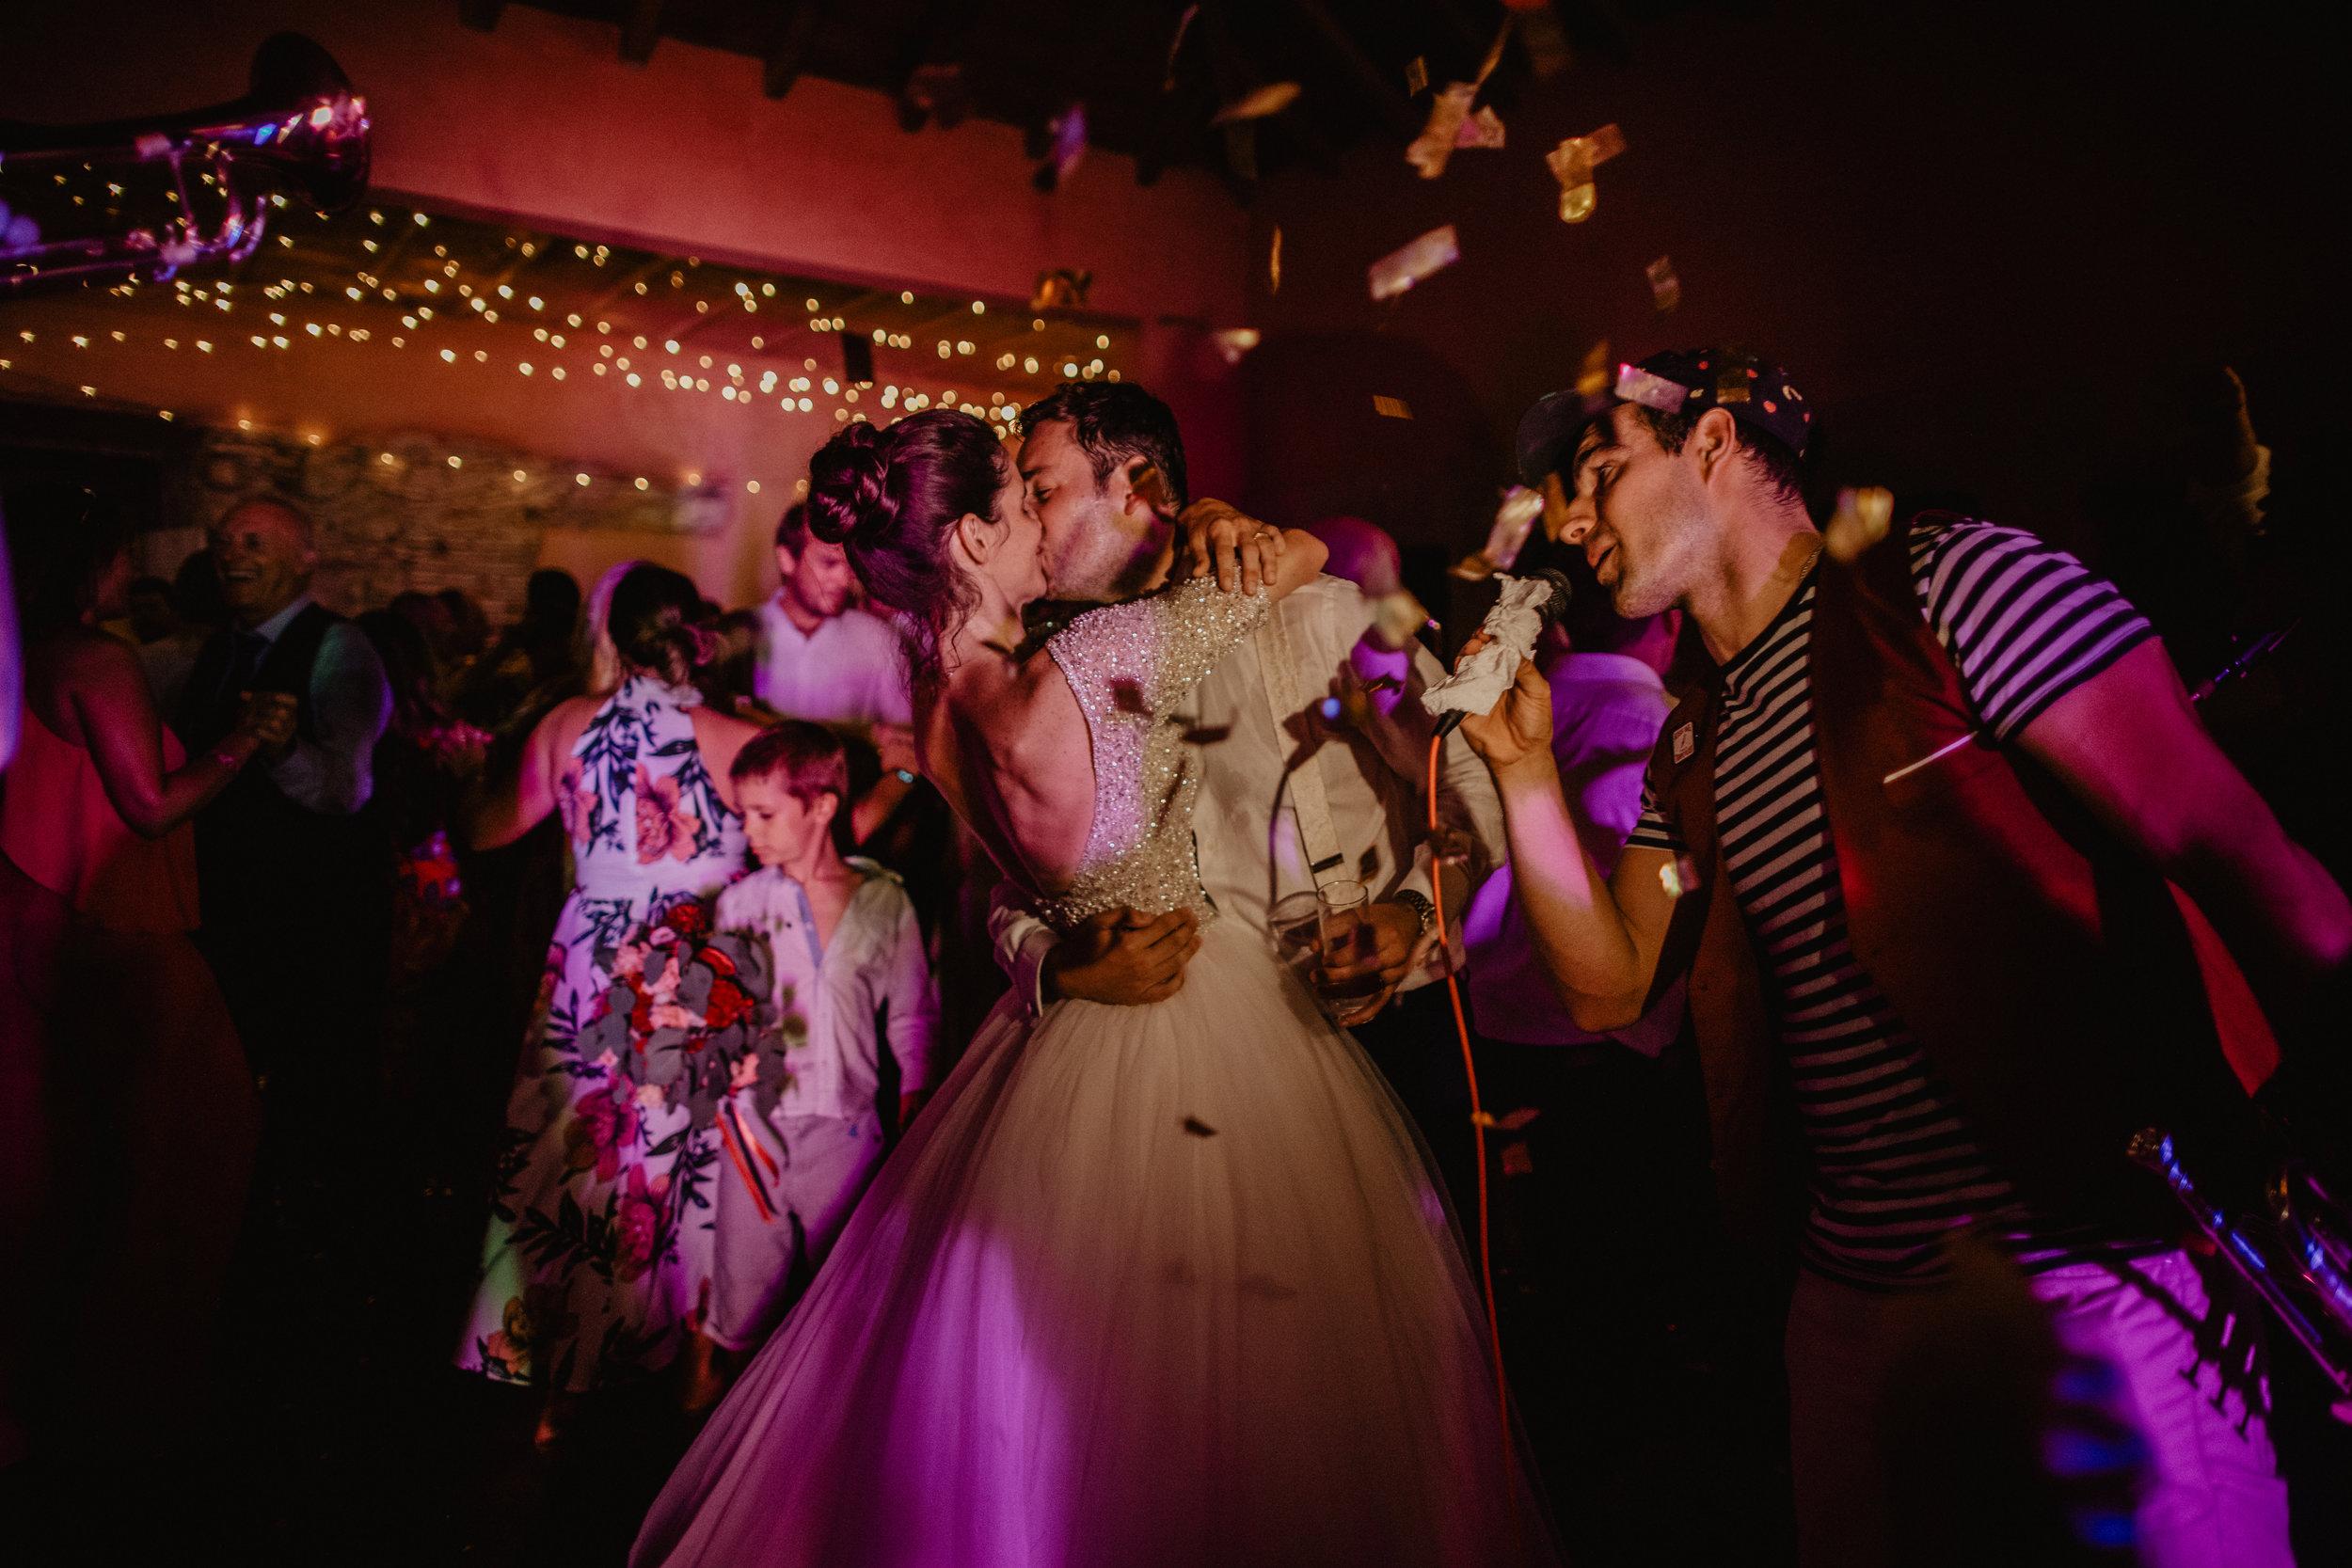 Lapela-photography-wedding-sintra-portugal-138.jpg